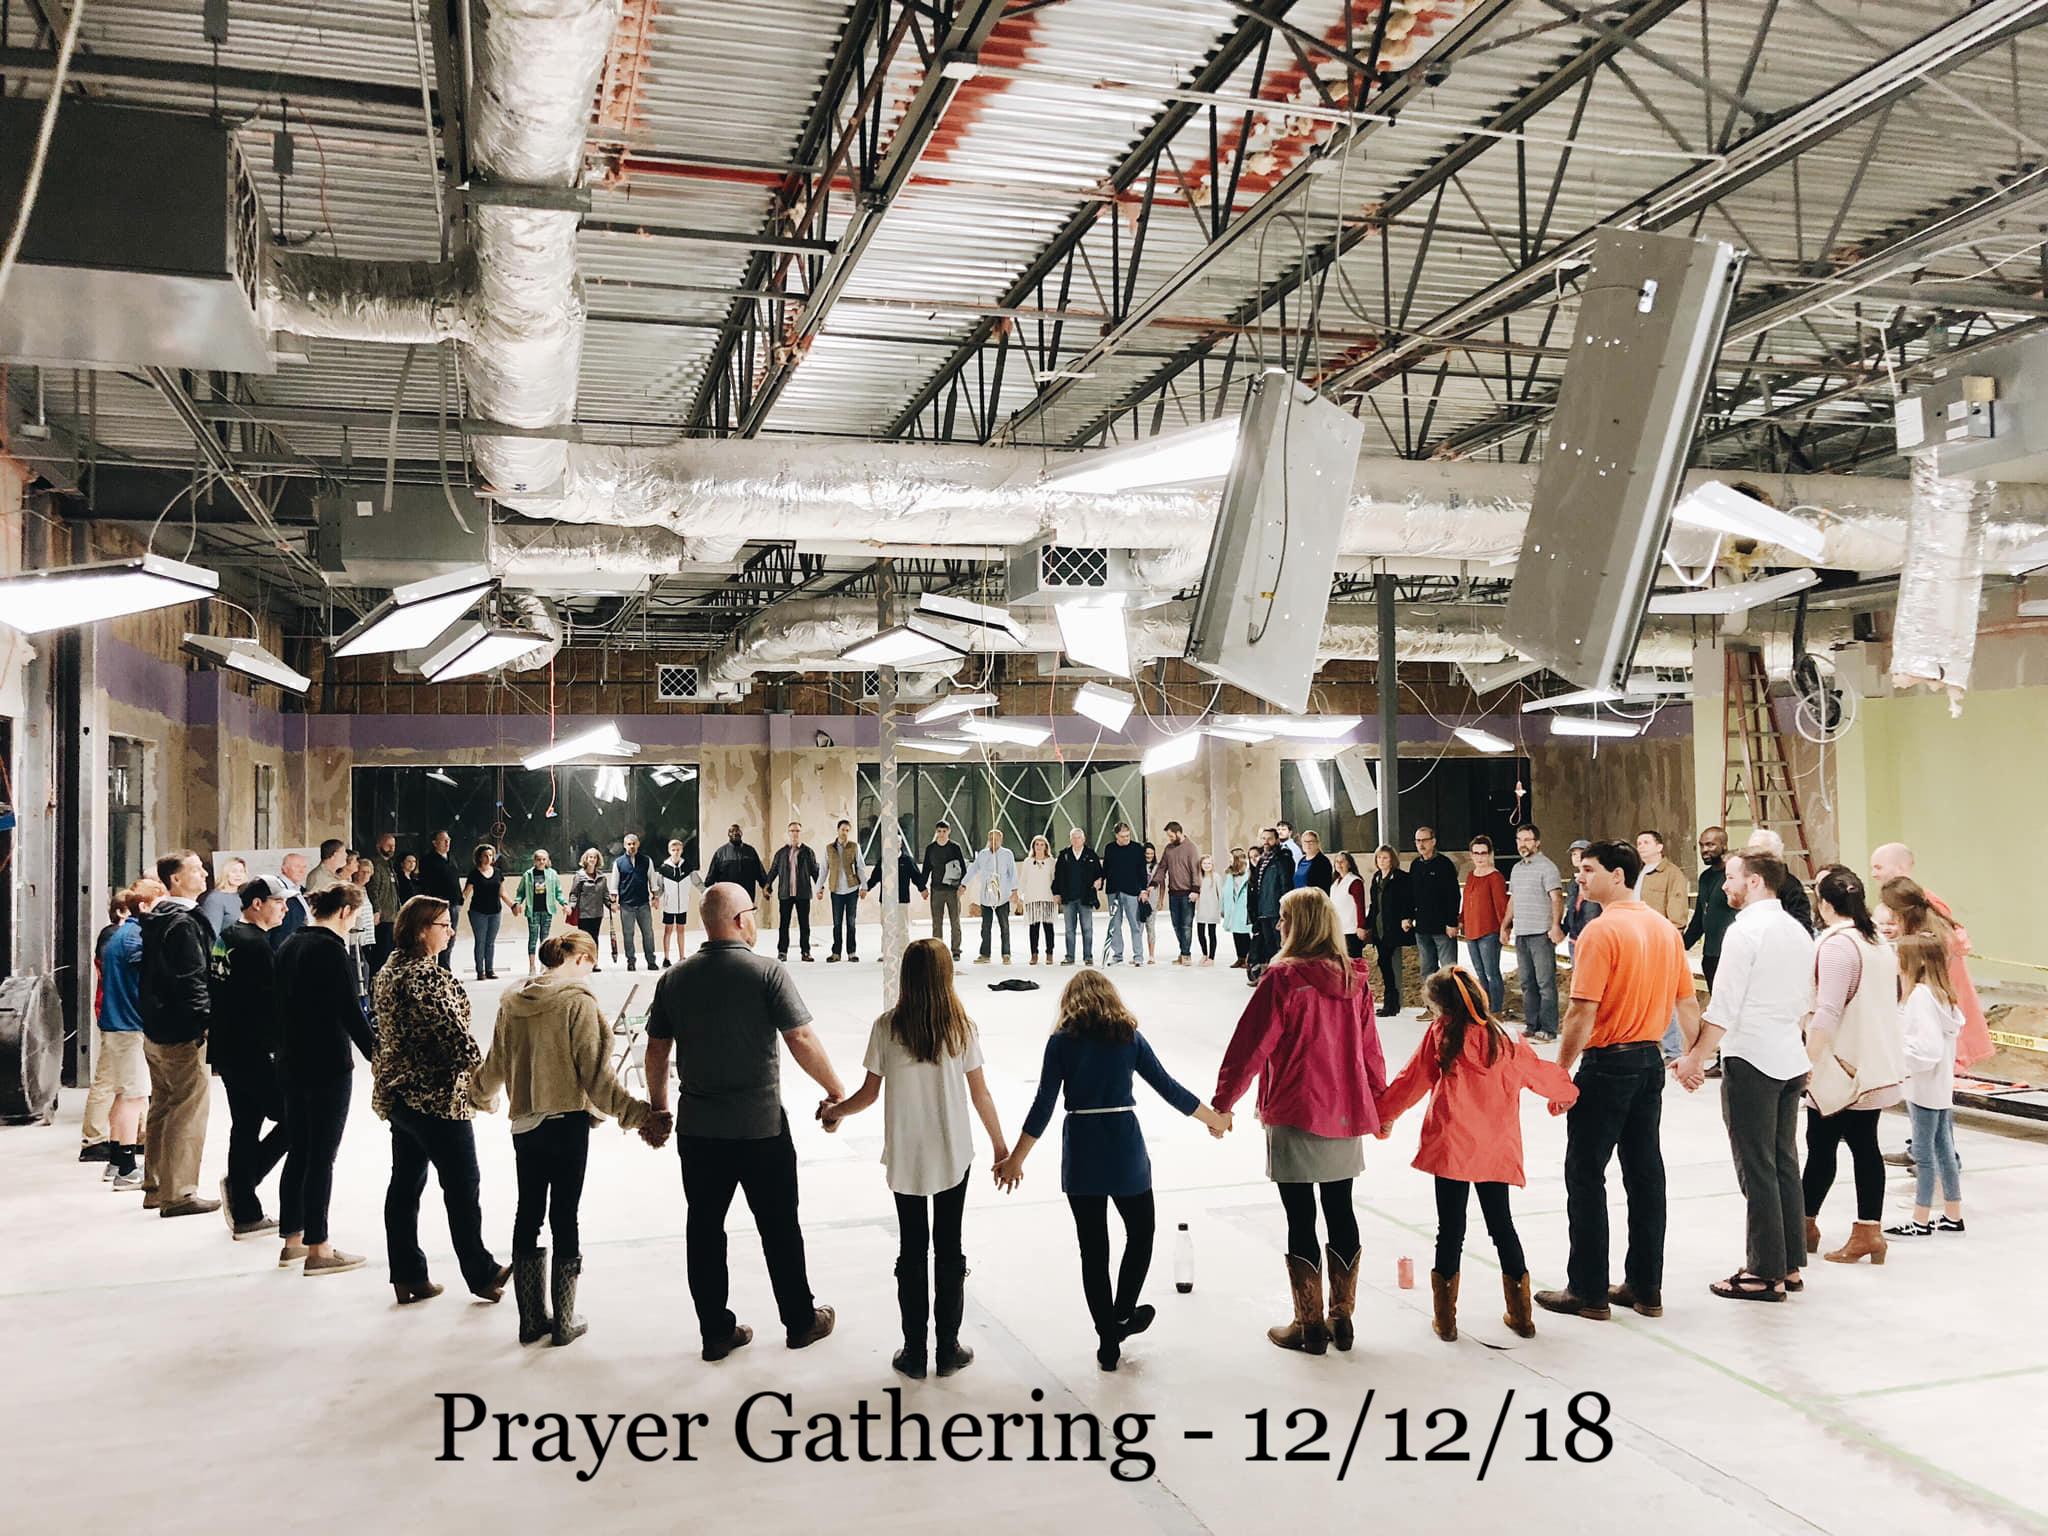 _Prayer Night 1 - Dec 12 2018.jpg